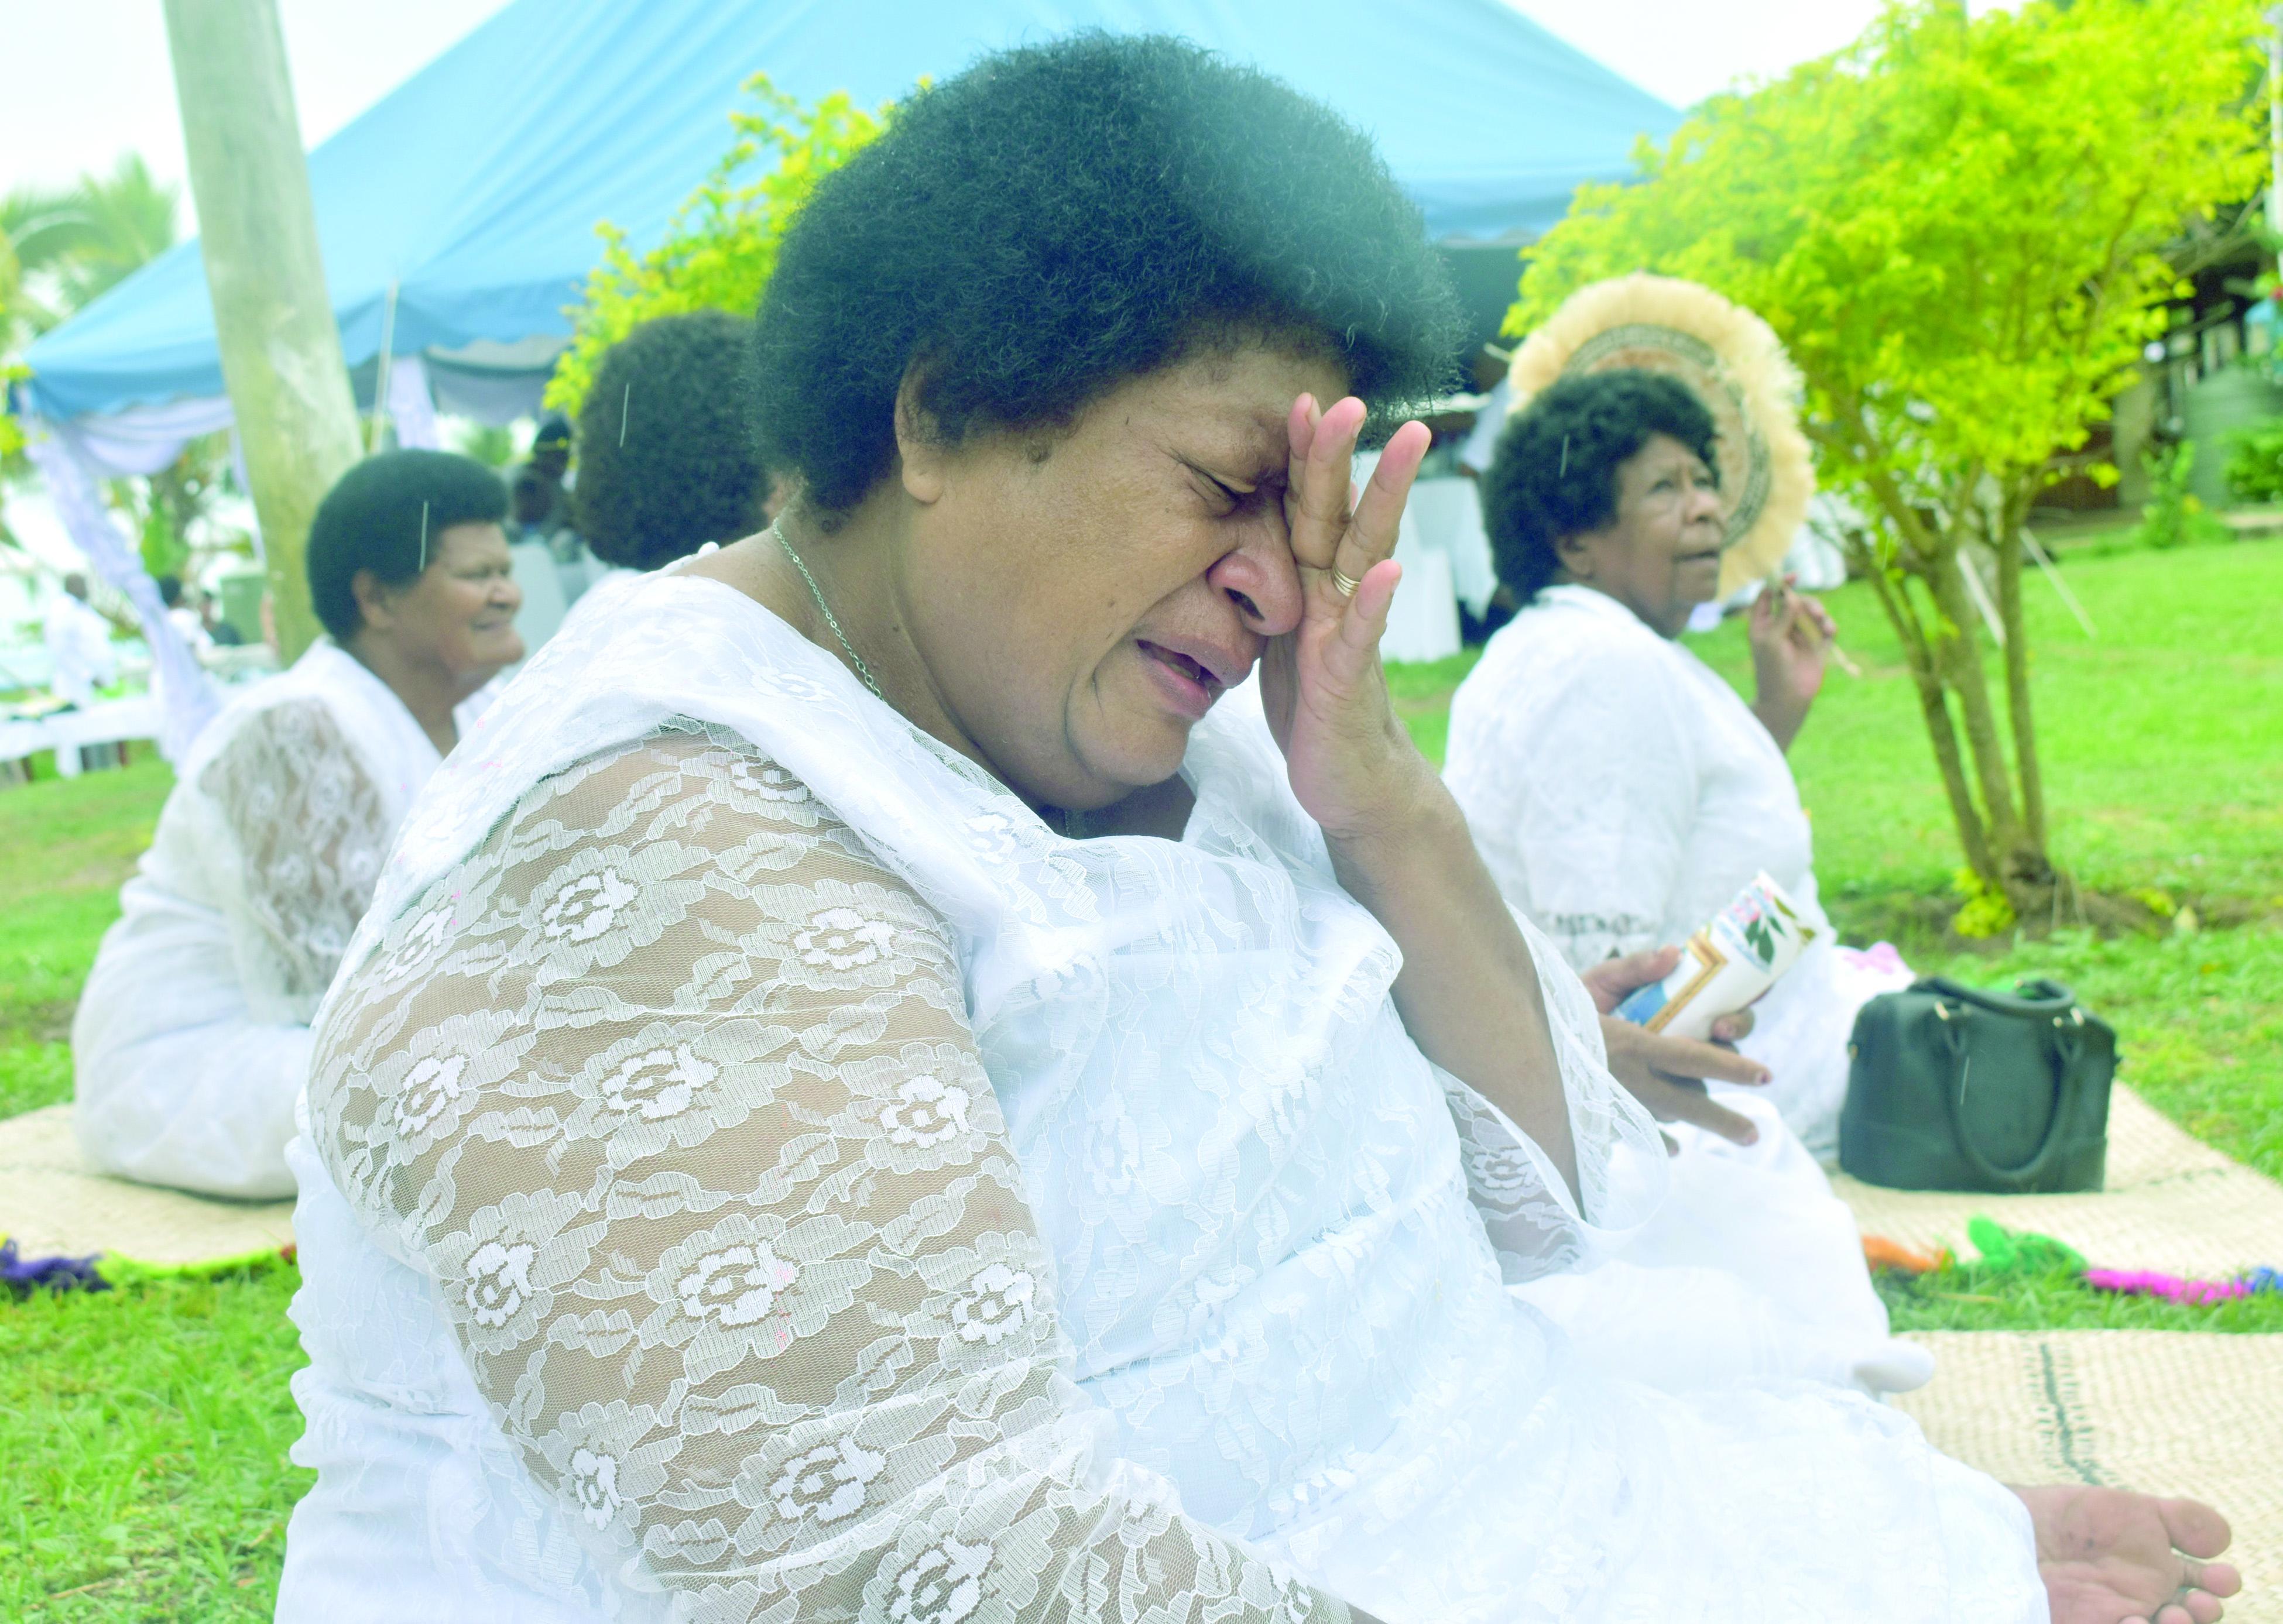 Adi Merewai Lalabalavu weaps beside the chiefly burial site where her husband Momo Na Tui Lawa, Ratu Sevanaia Lalabalavu was laid to rest on 22 November 2017. Photo: Arieta Vakasukawaqa